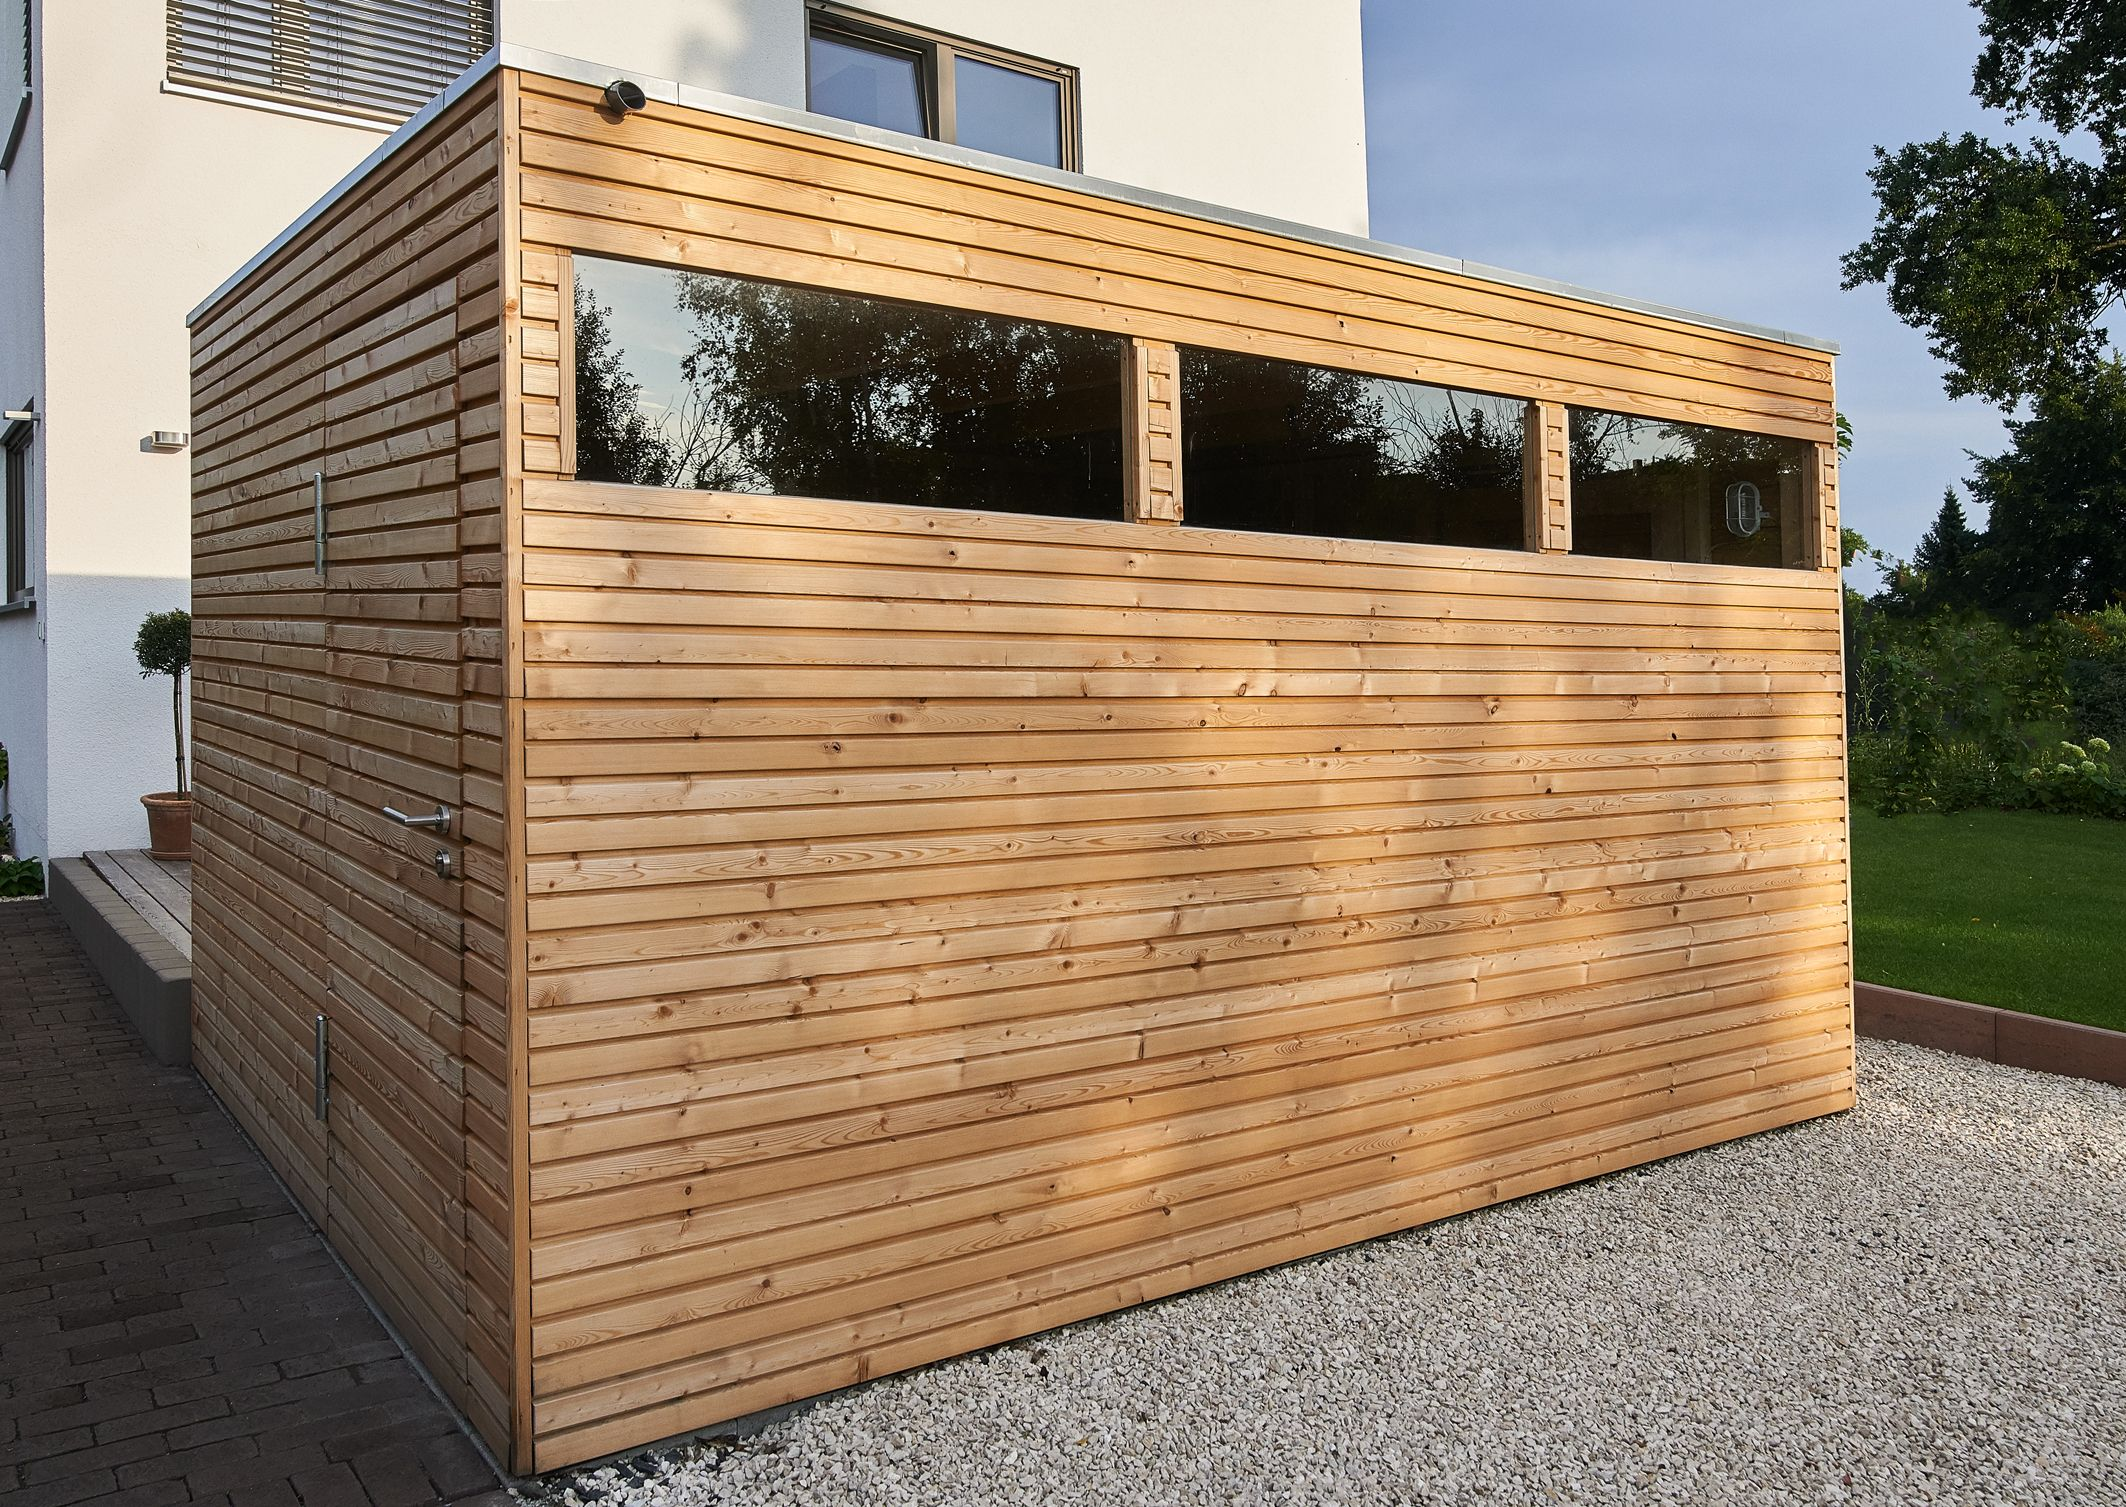 Design Gartenhaus Geratehaus Design Gartenhaus Gartenhaus Gartenhaus Bauen